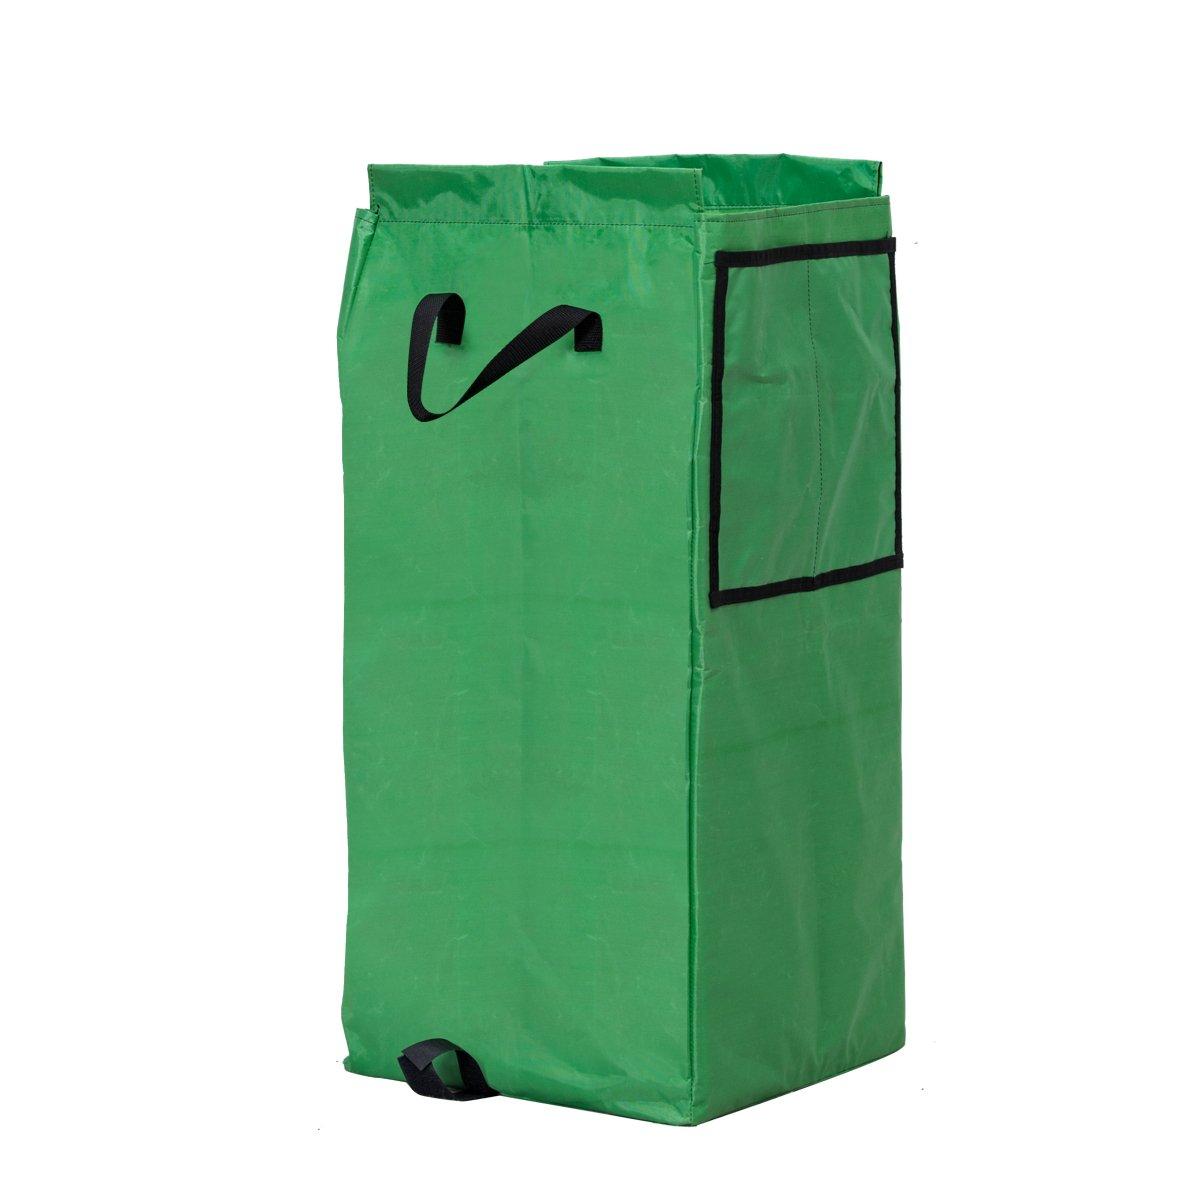 Goplus Portable Gardening Lawn Leaf Bag Detachable Tote Cart Multifunctional Folding Basket w/ Pocket Green by Goplus (Image #7)